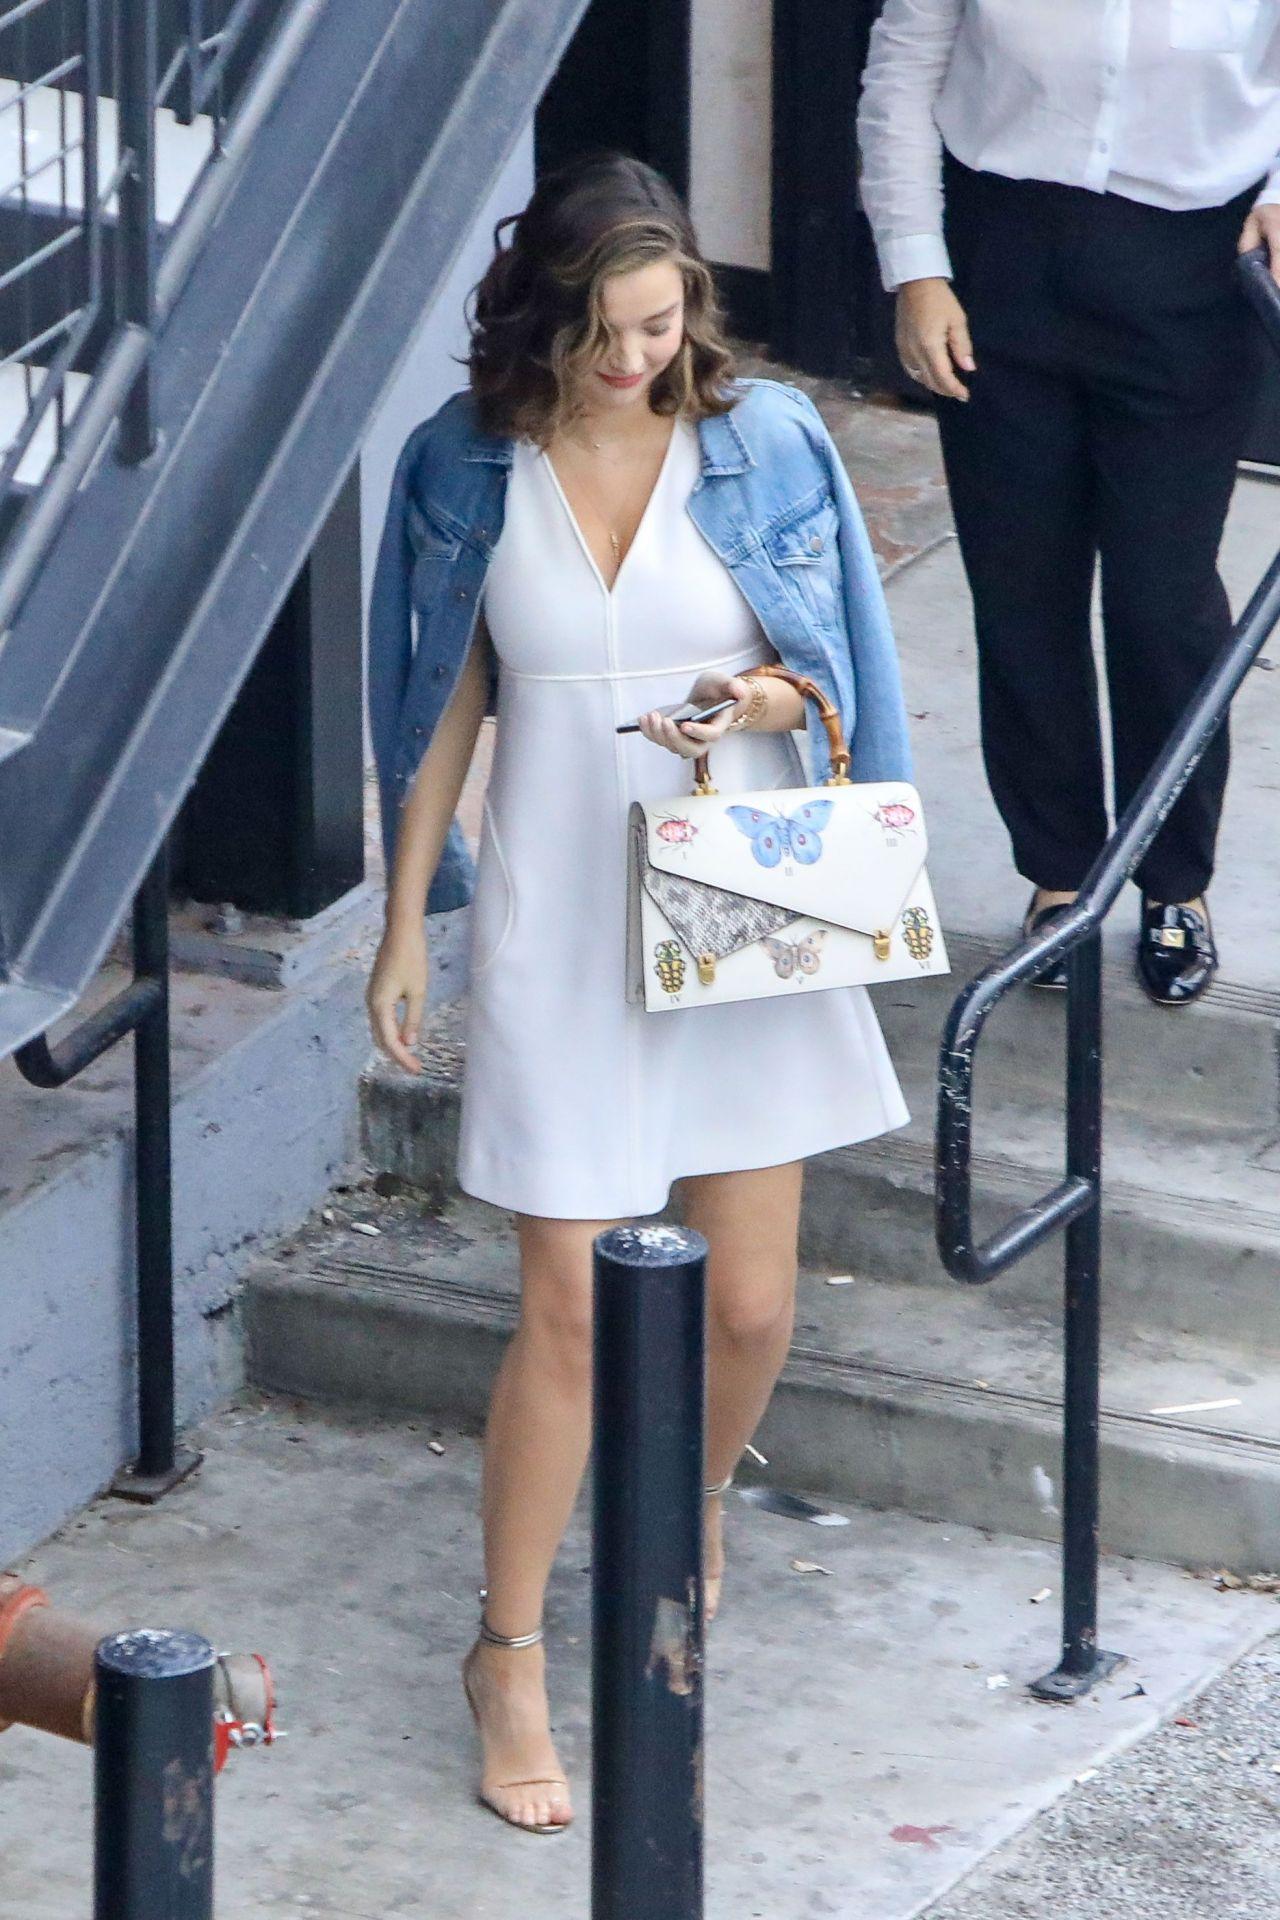 Miranda Kerr Arrivers To Her Meet And Greet At Sephora In Santa Monica